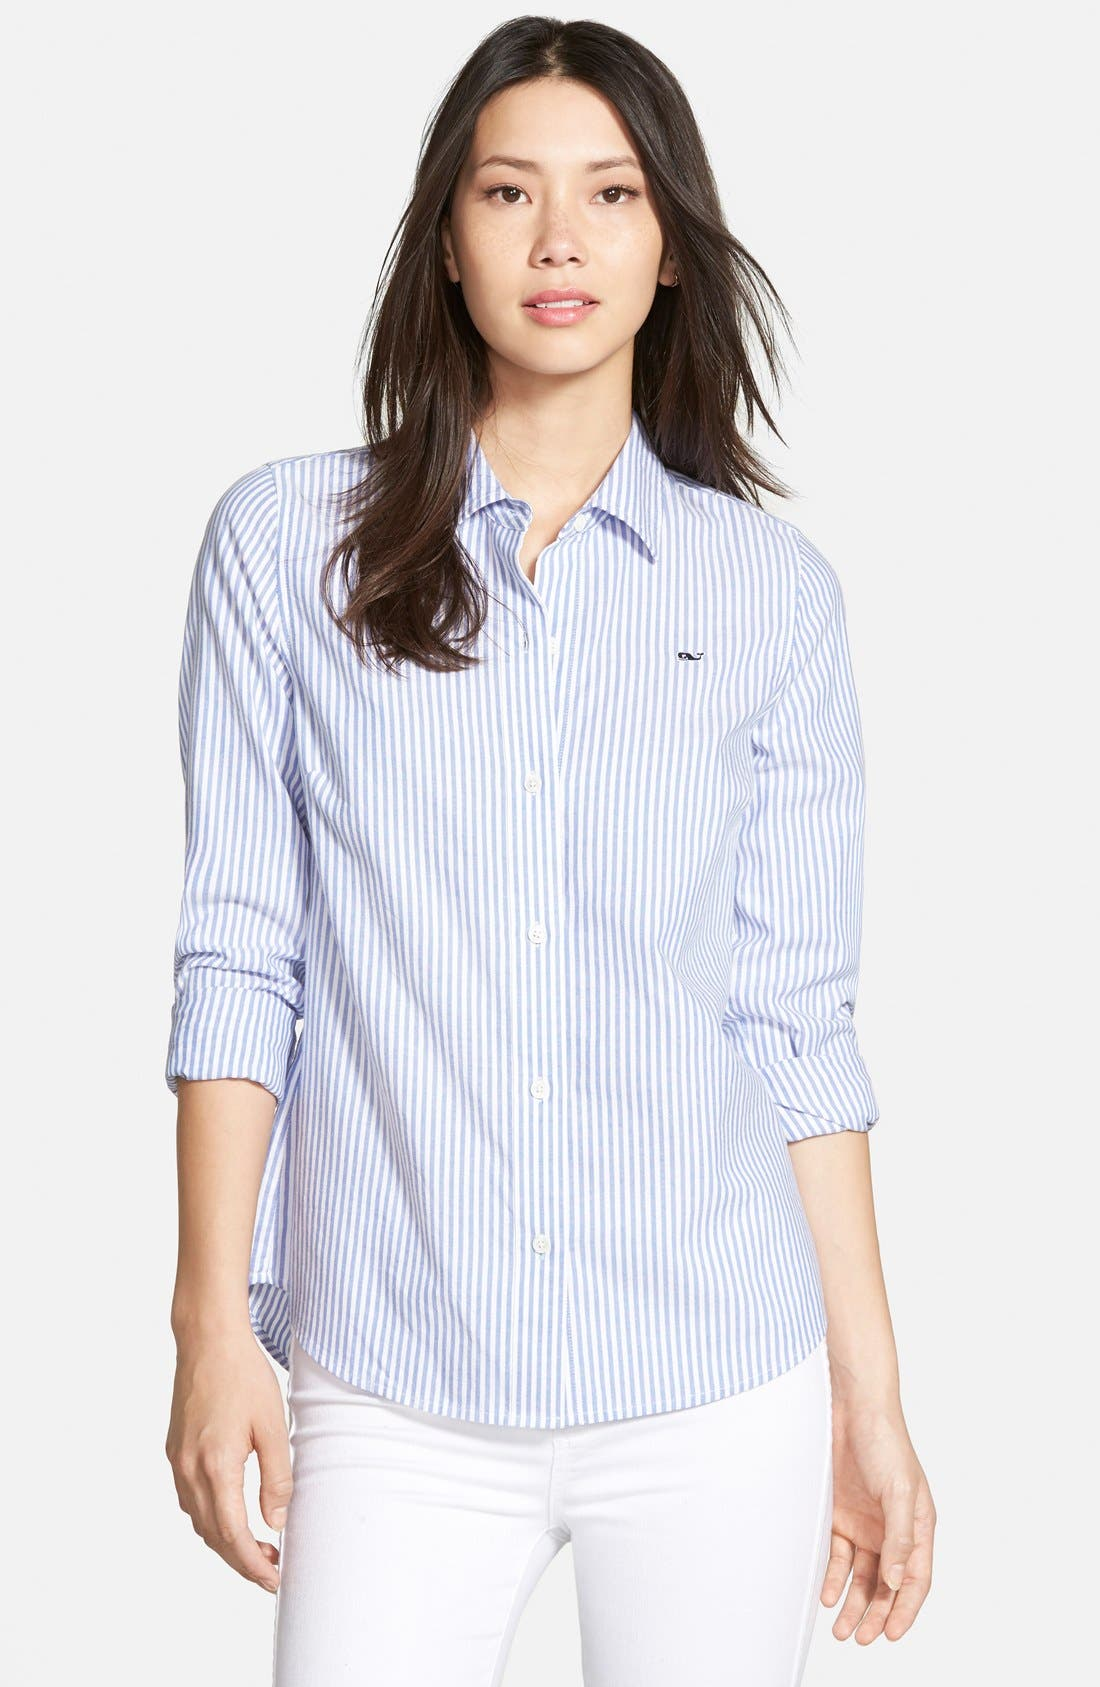 Alternate Image 1 Selected - Vineyard Vines Oxford Stripe Shirt